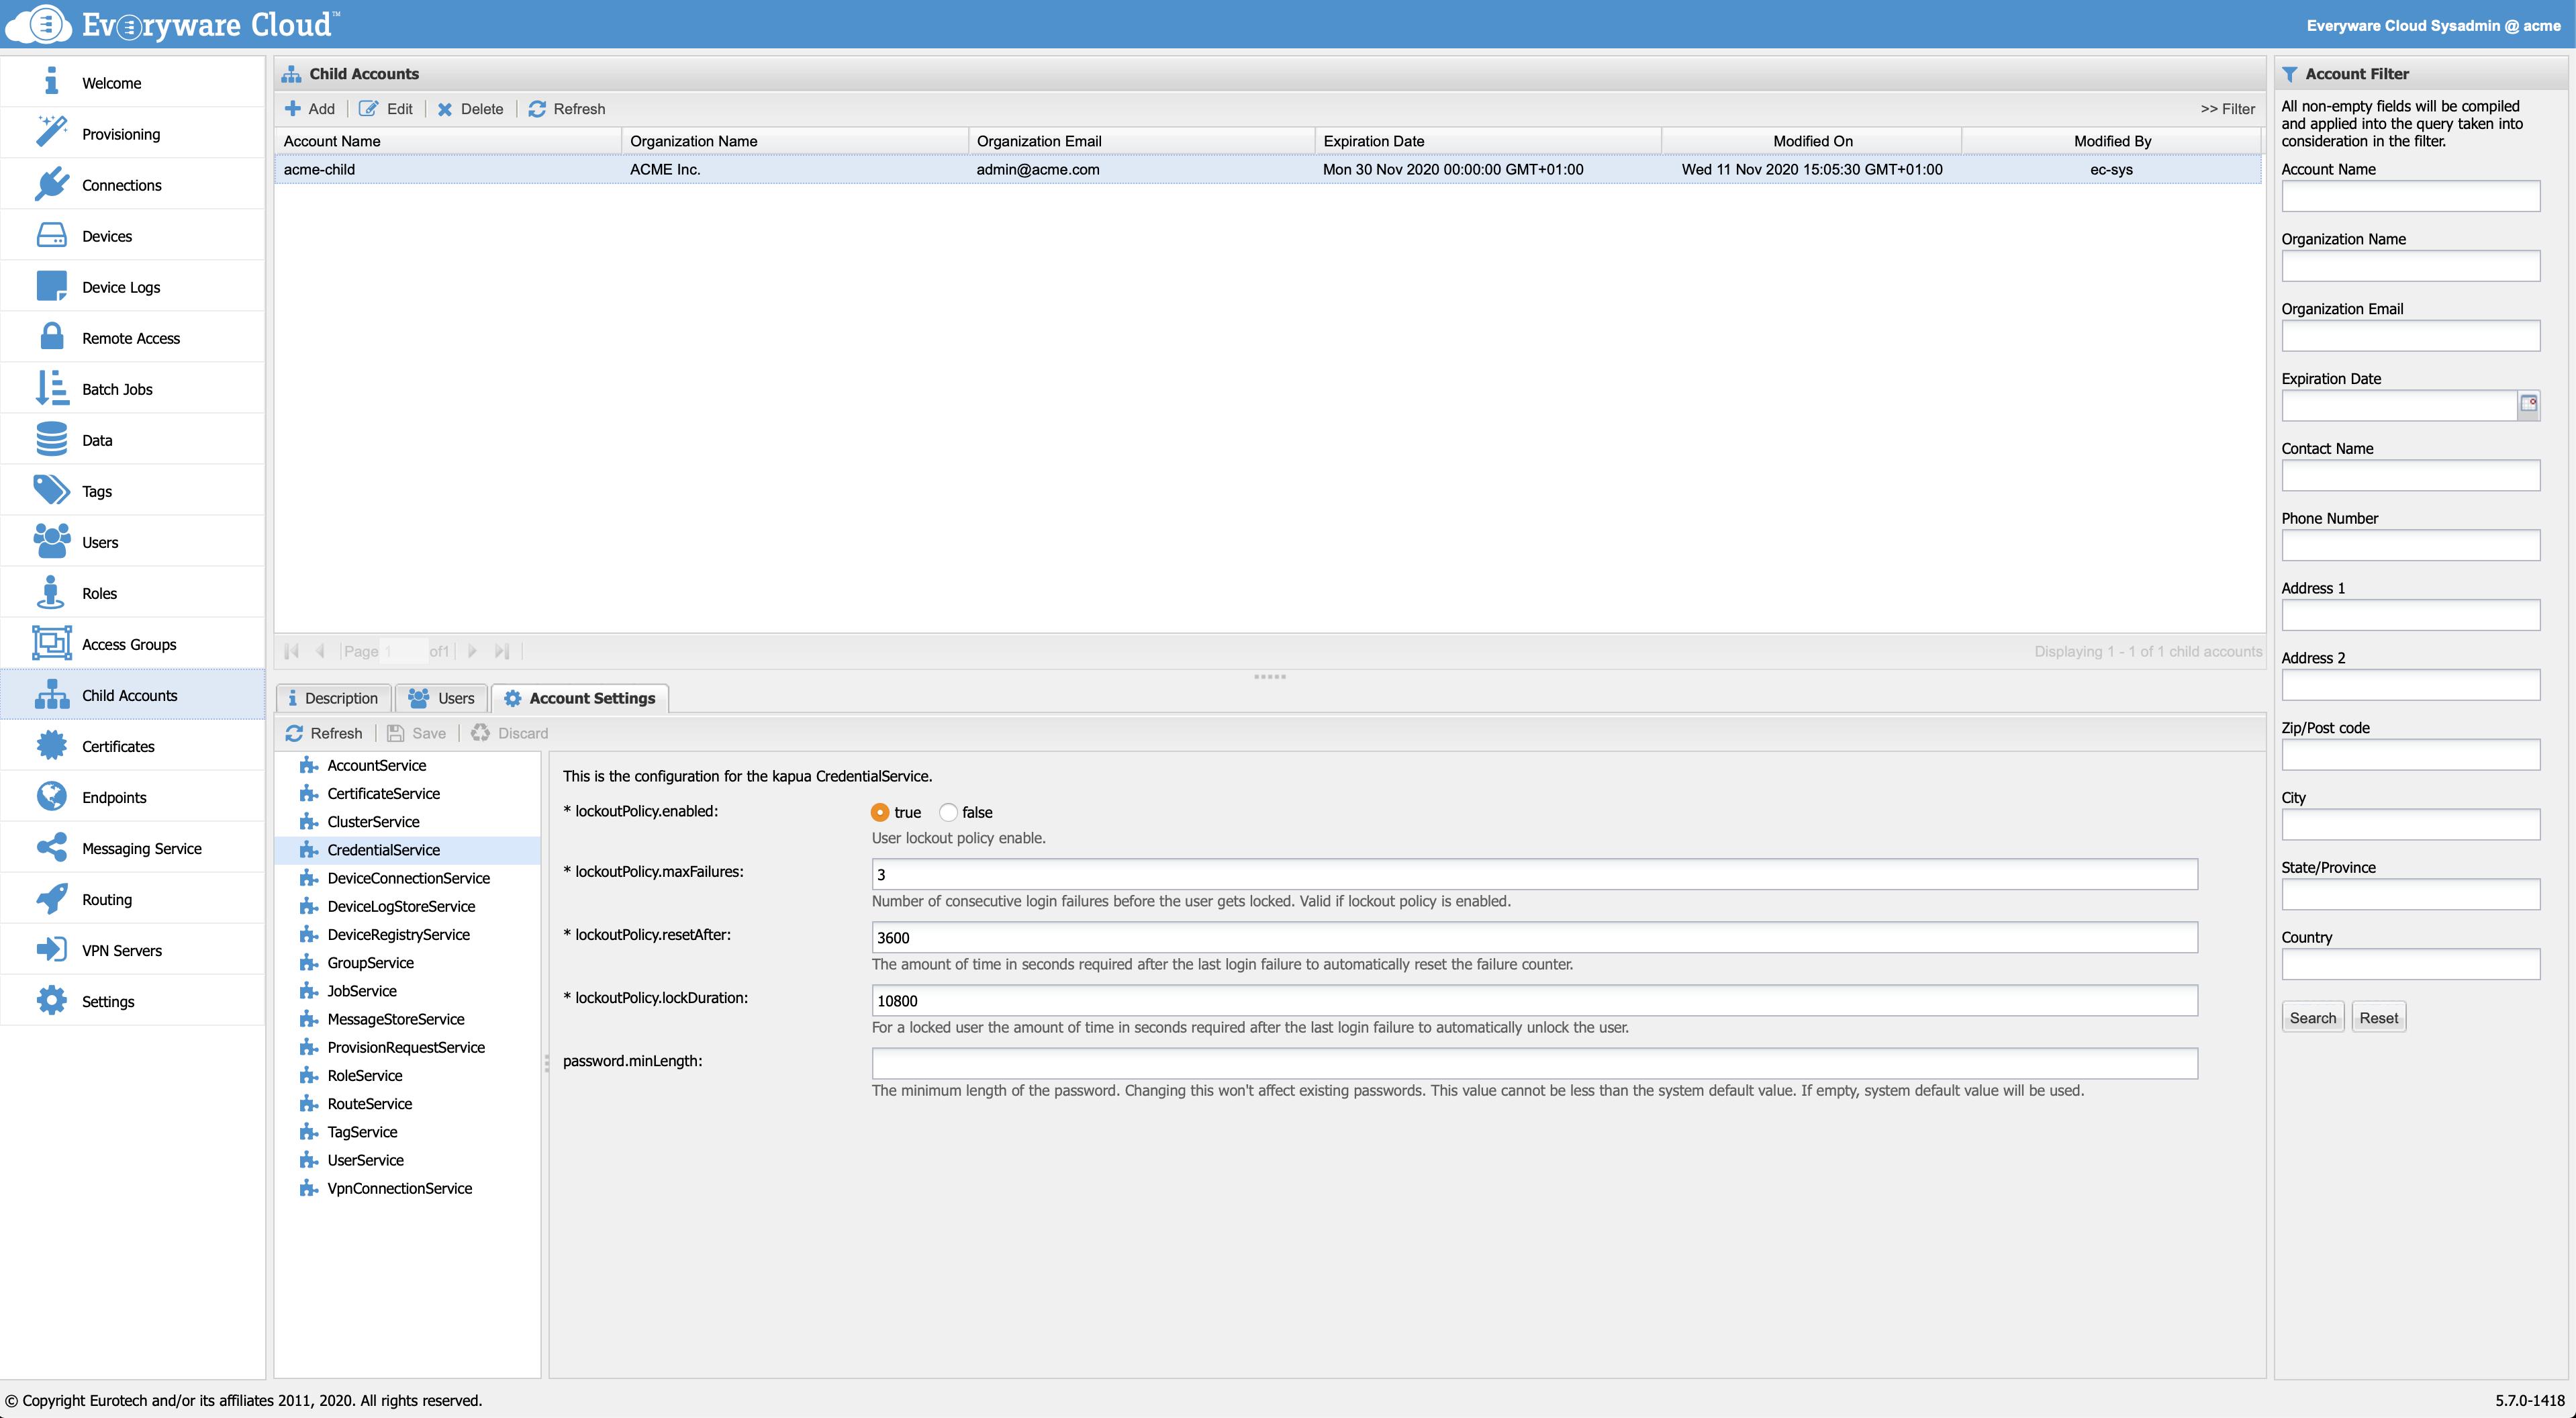 CredentialService configuration